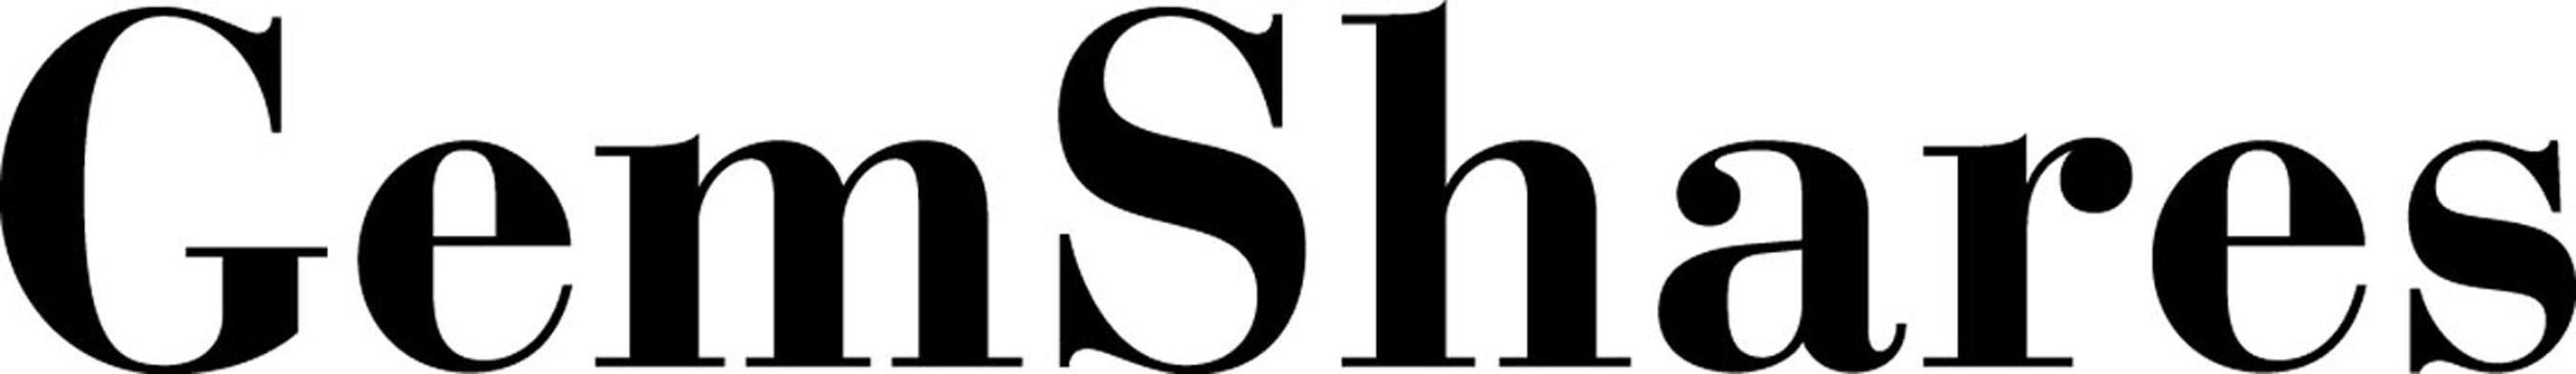 GemShares logo. (PRNewsFoto/GemShares, LLC) (PRNewsFoto/GEMSHARES, LLC)